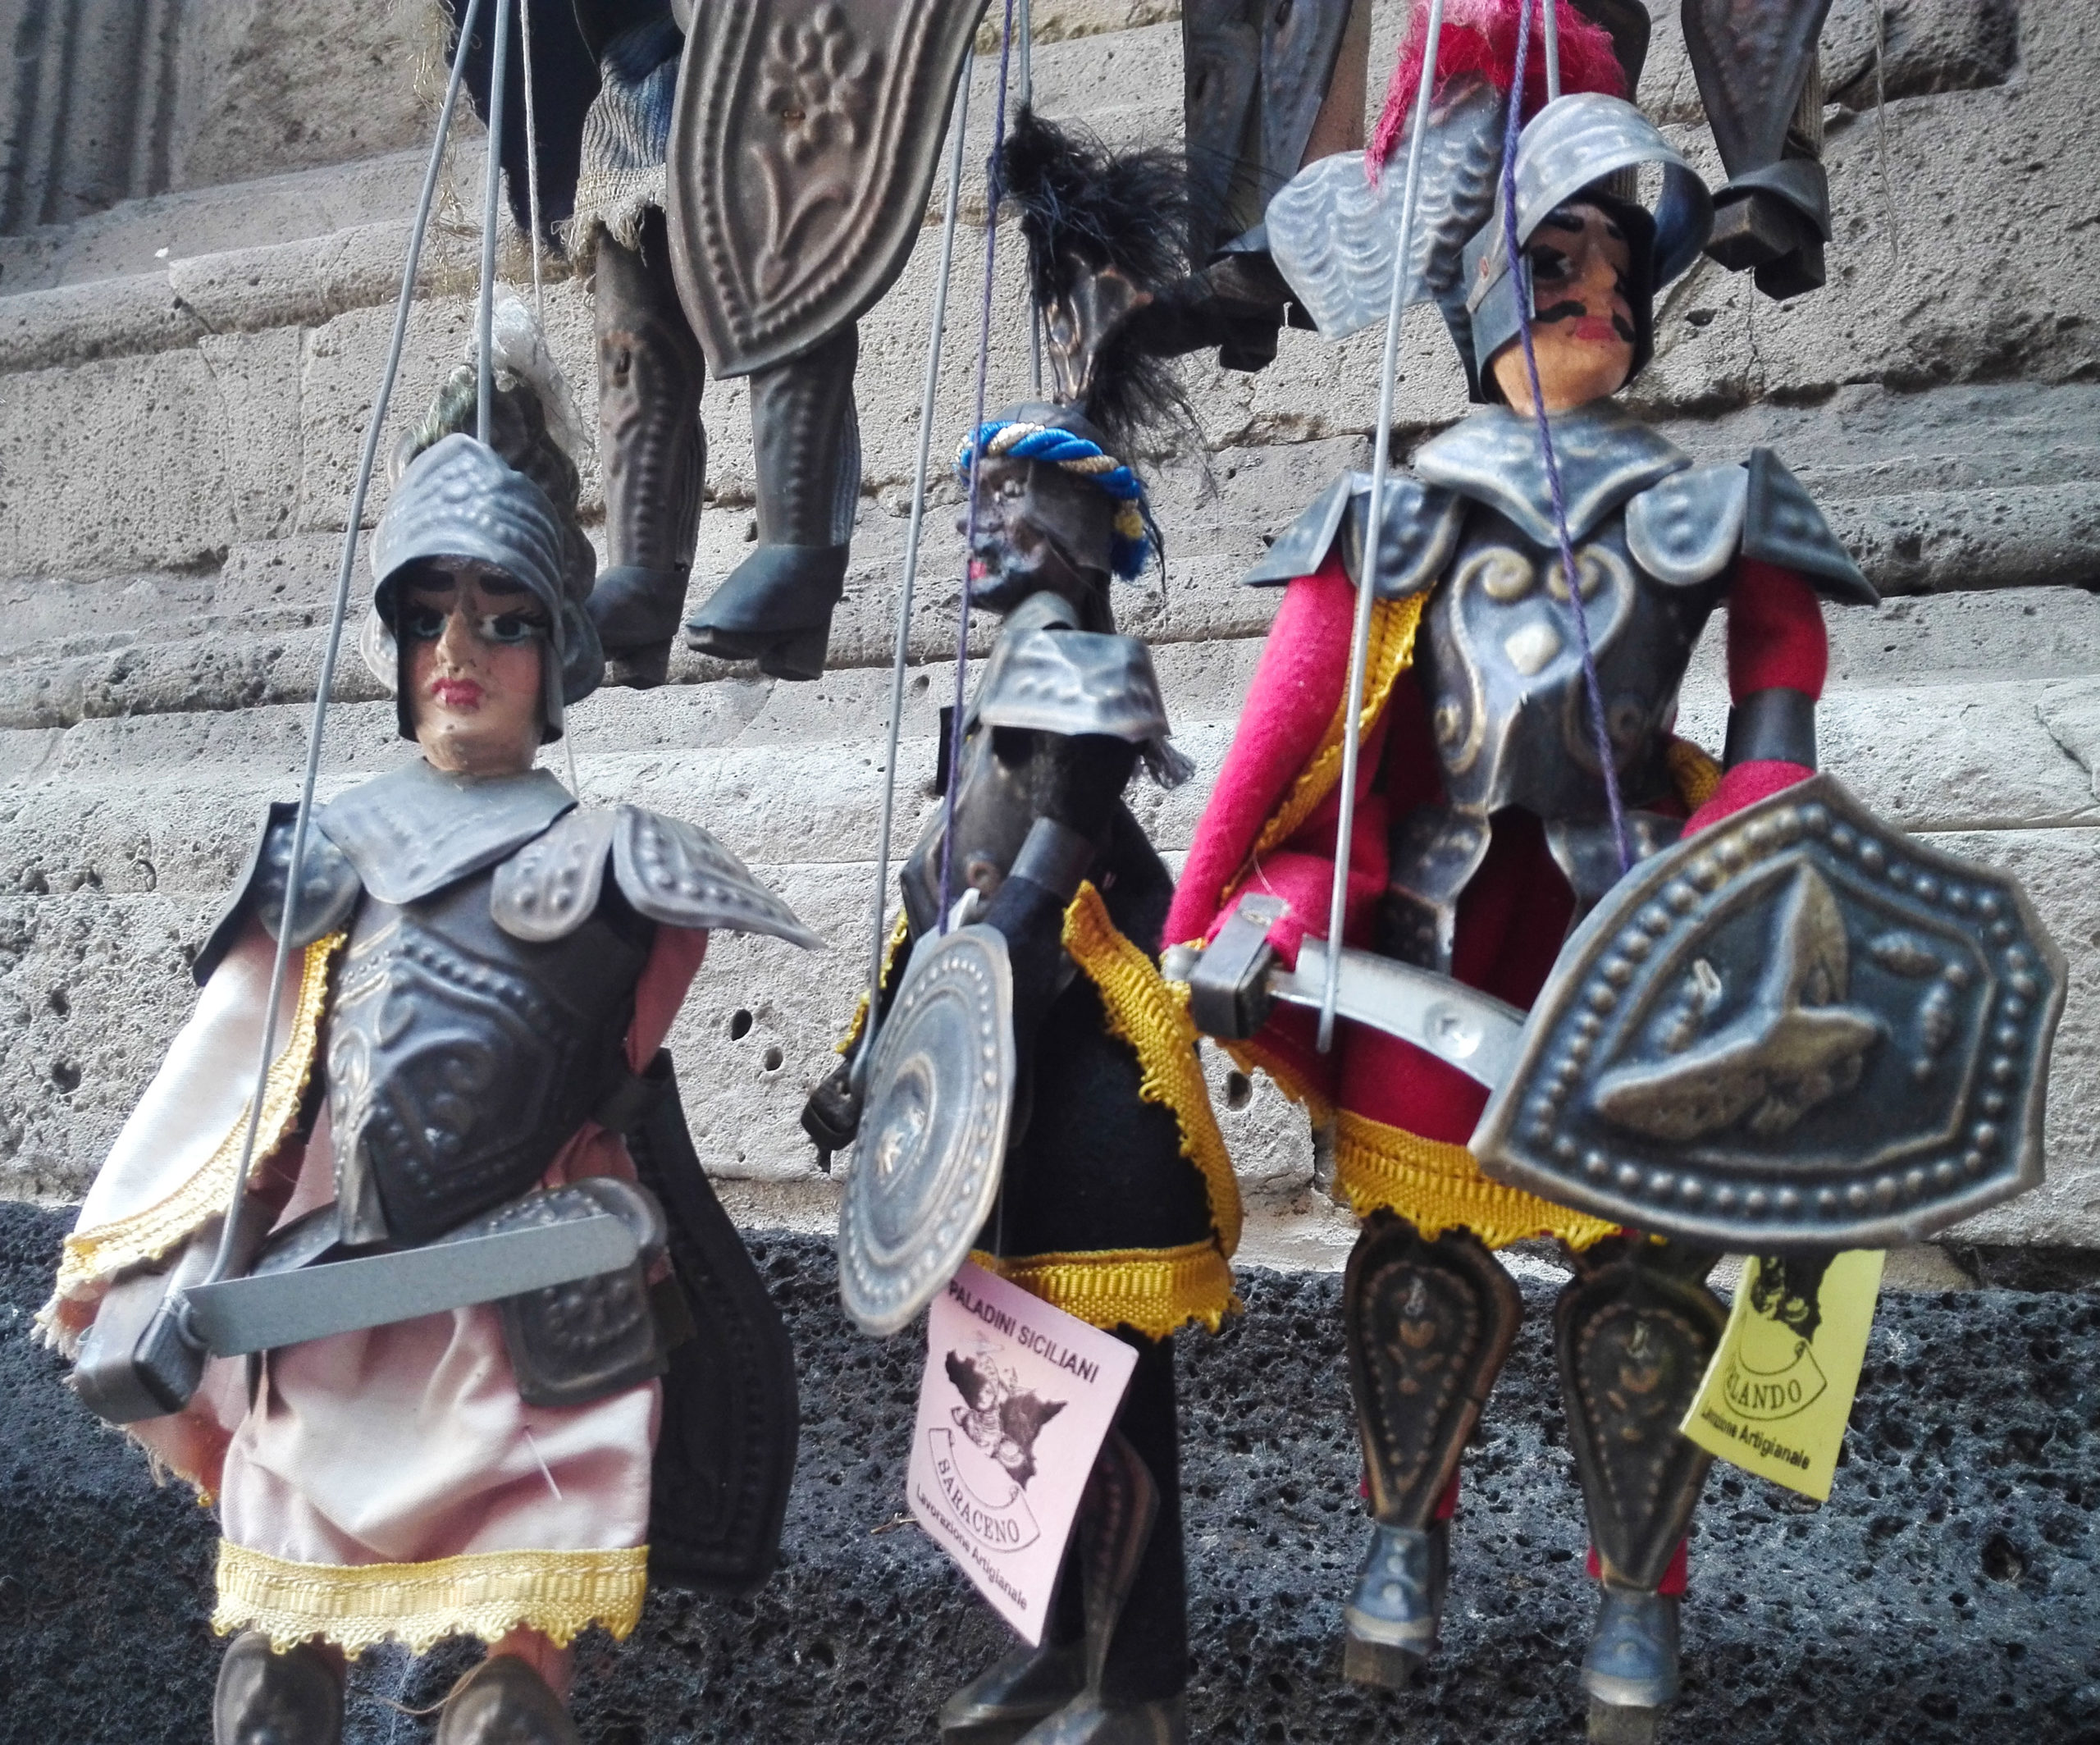 sicily dolls, 20 italian red wines